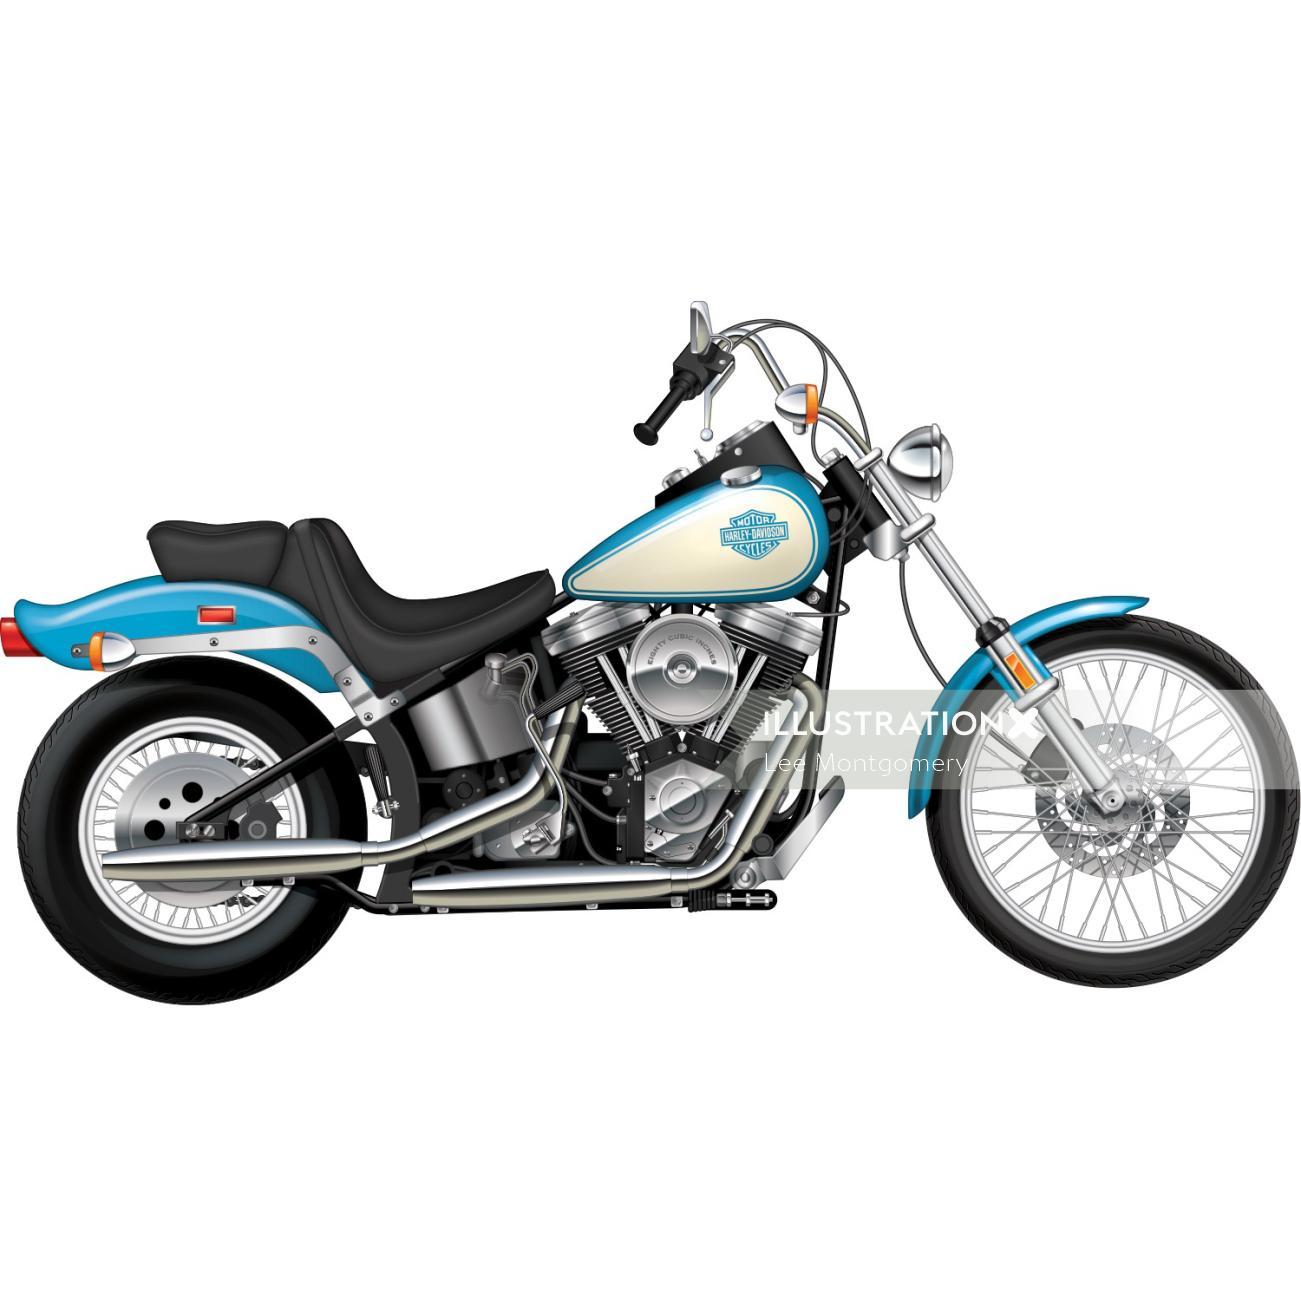 Illustration of Harley Davidson